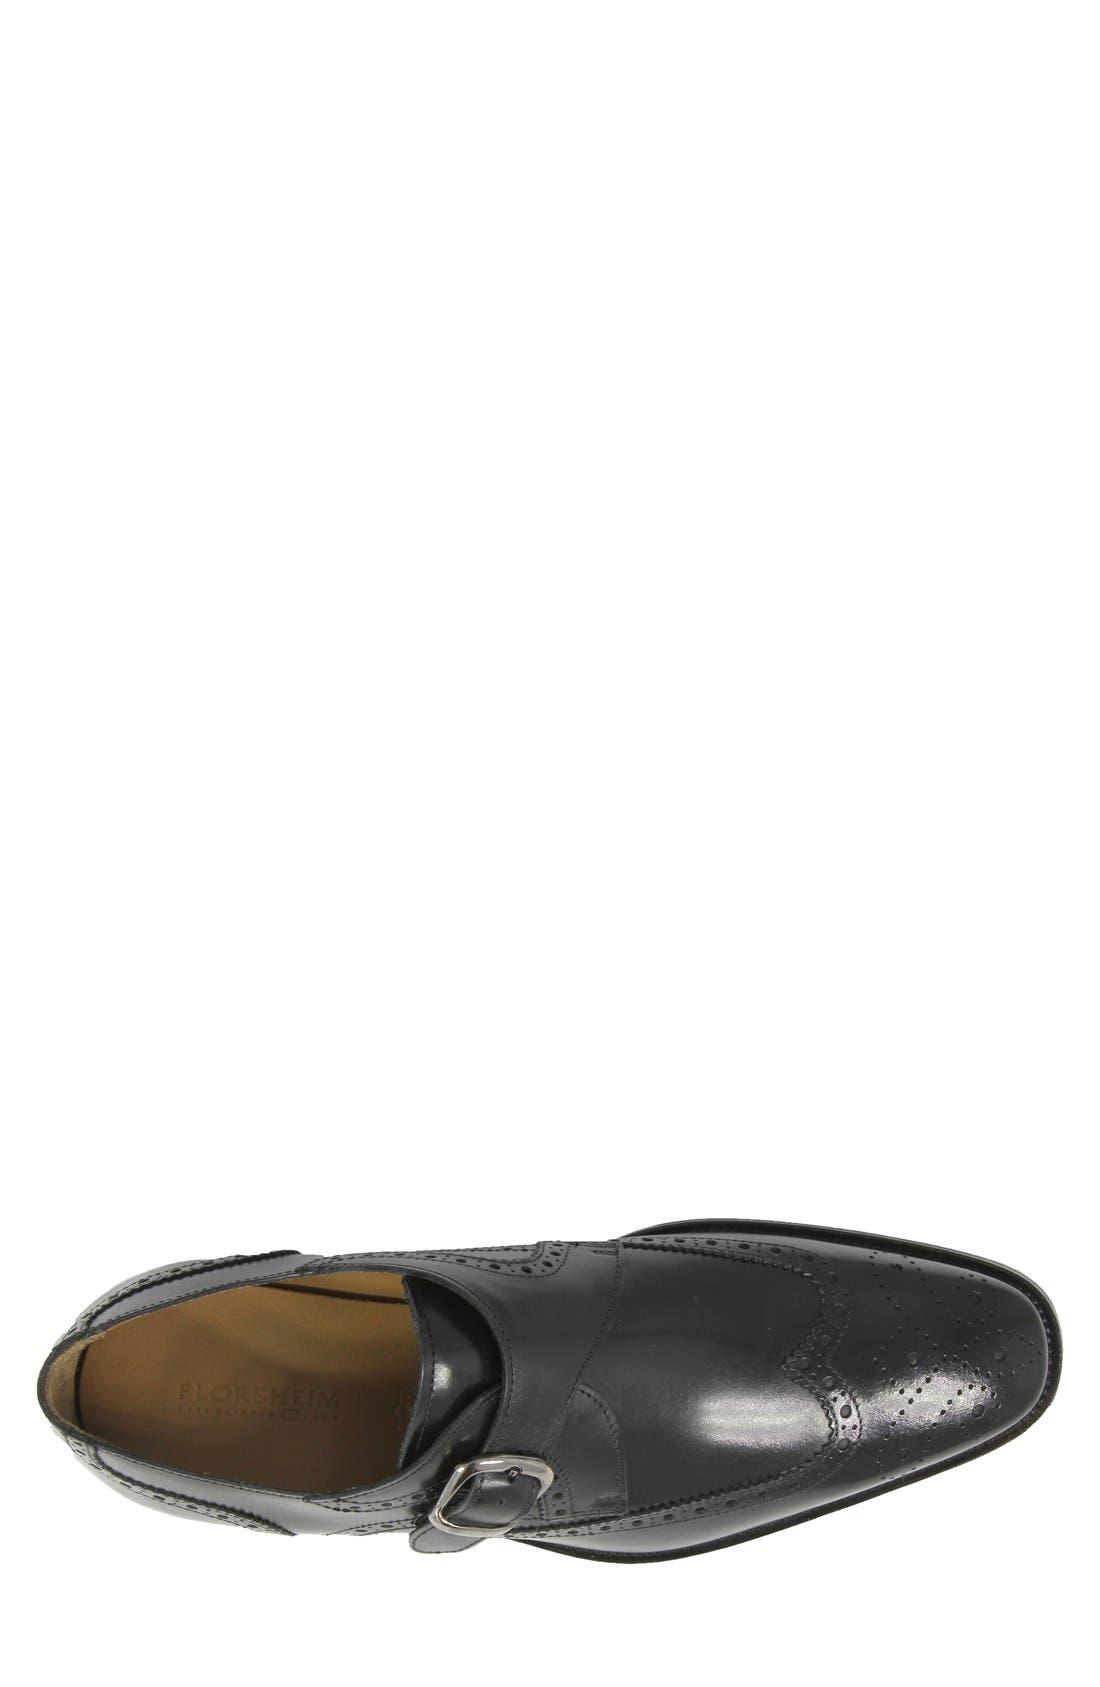 'Sabato' Wingtip Monk Strap Shoe,                             Alternate thumbnail 3, color,                             Black